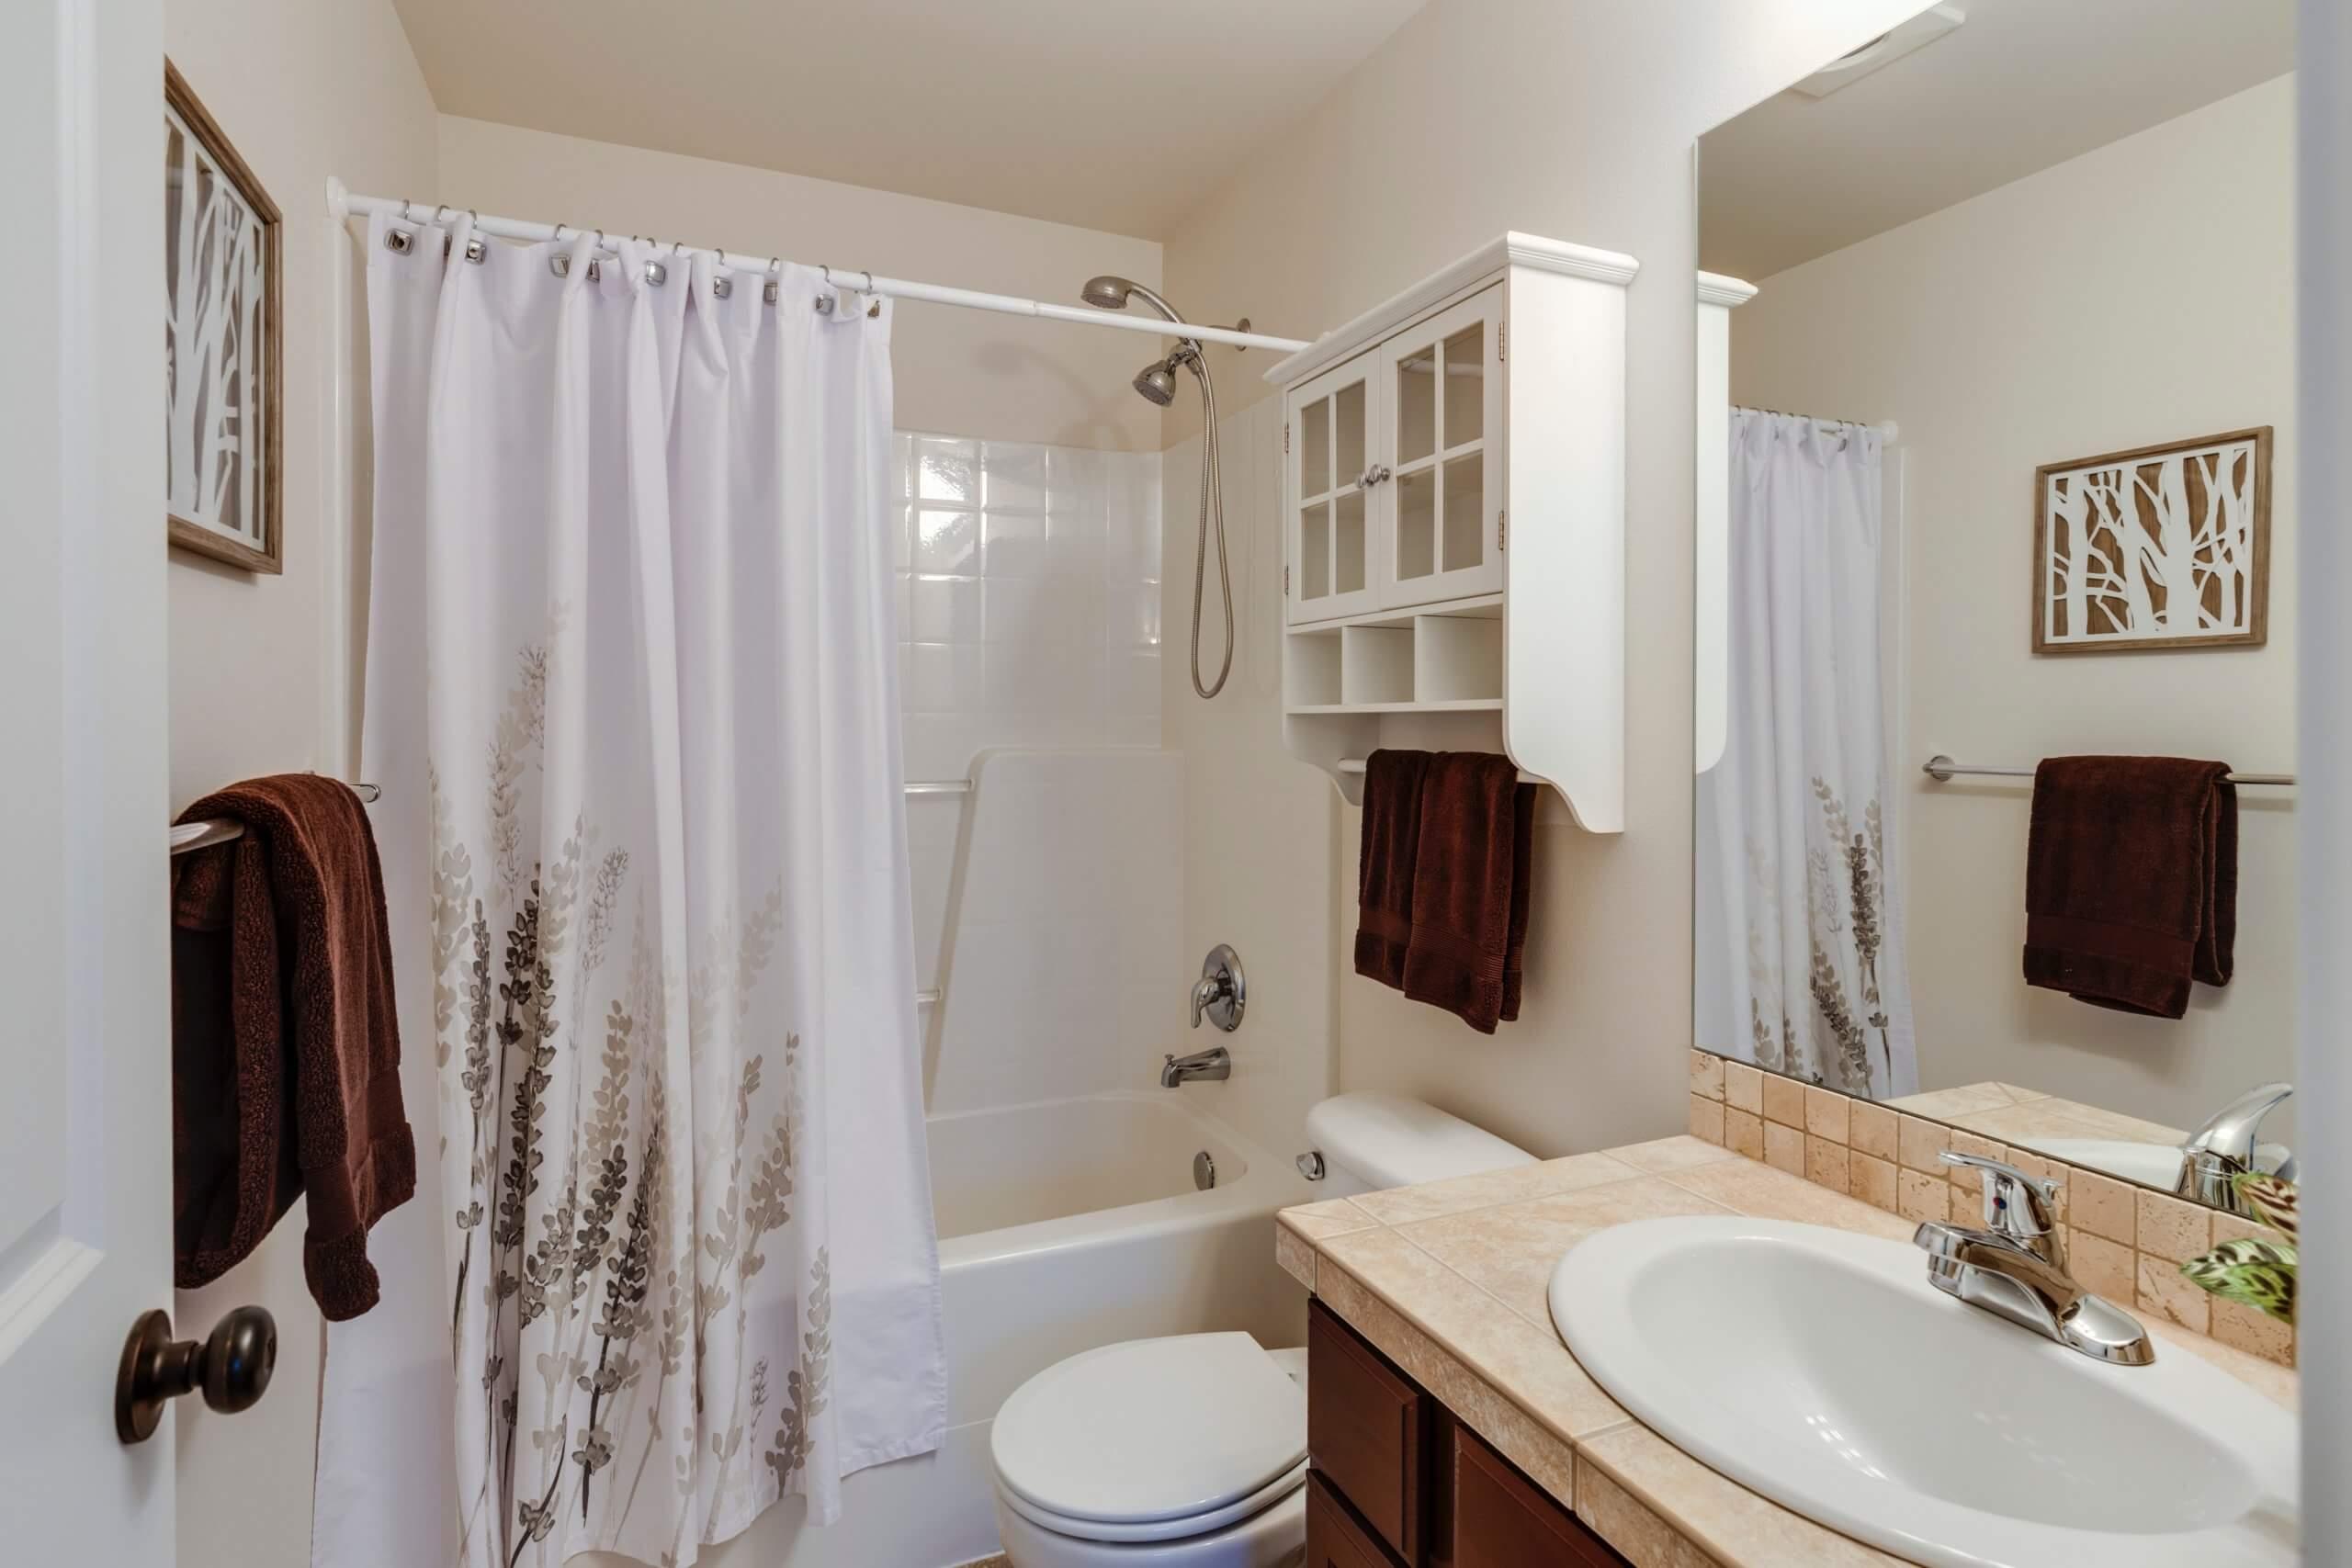 Bathroom Remodel: Tub to Shower Conversion